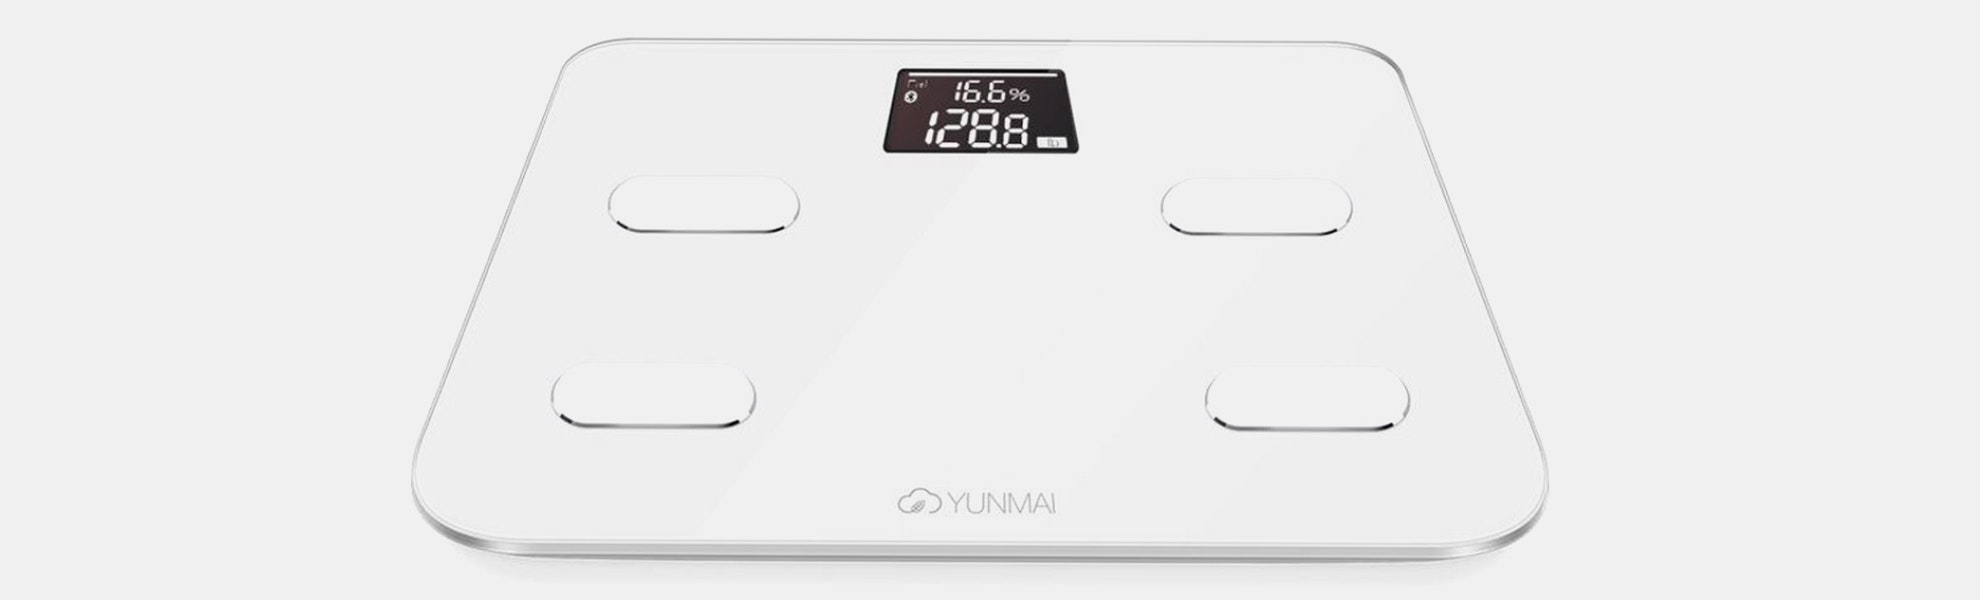 Yunmai Color Smart Scale w/10 Precise Measurements